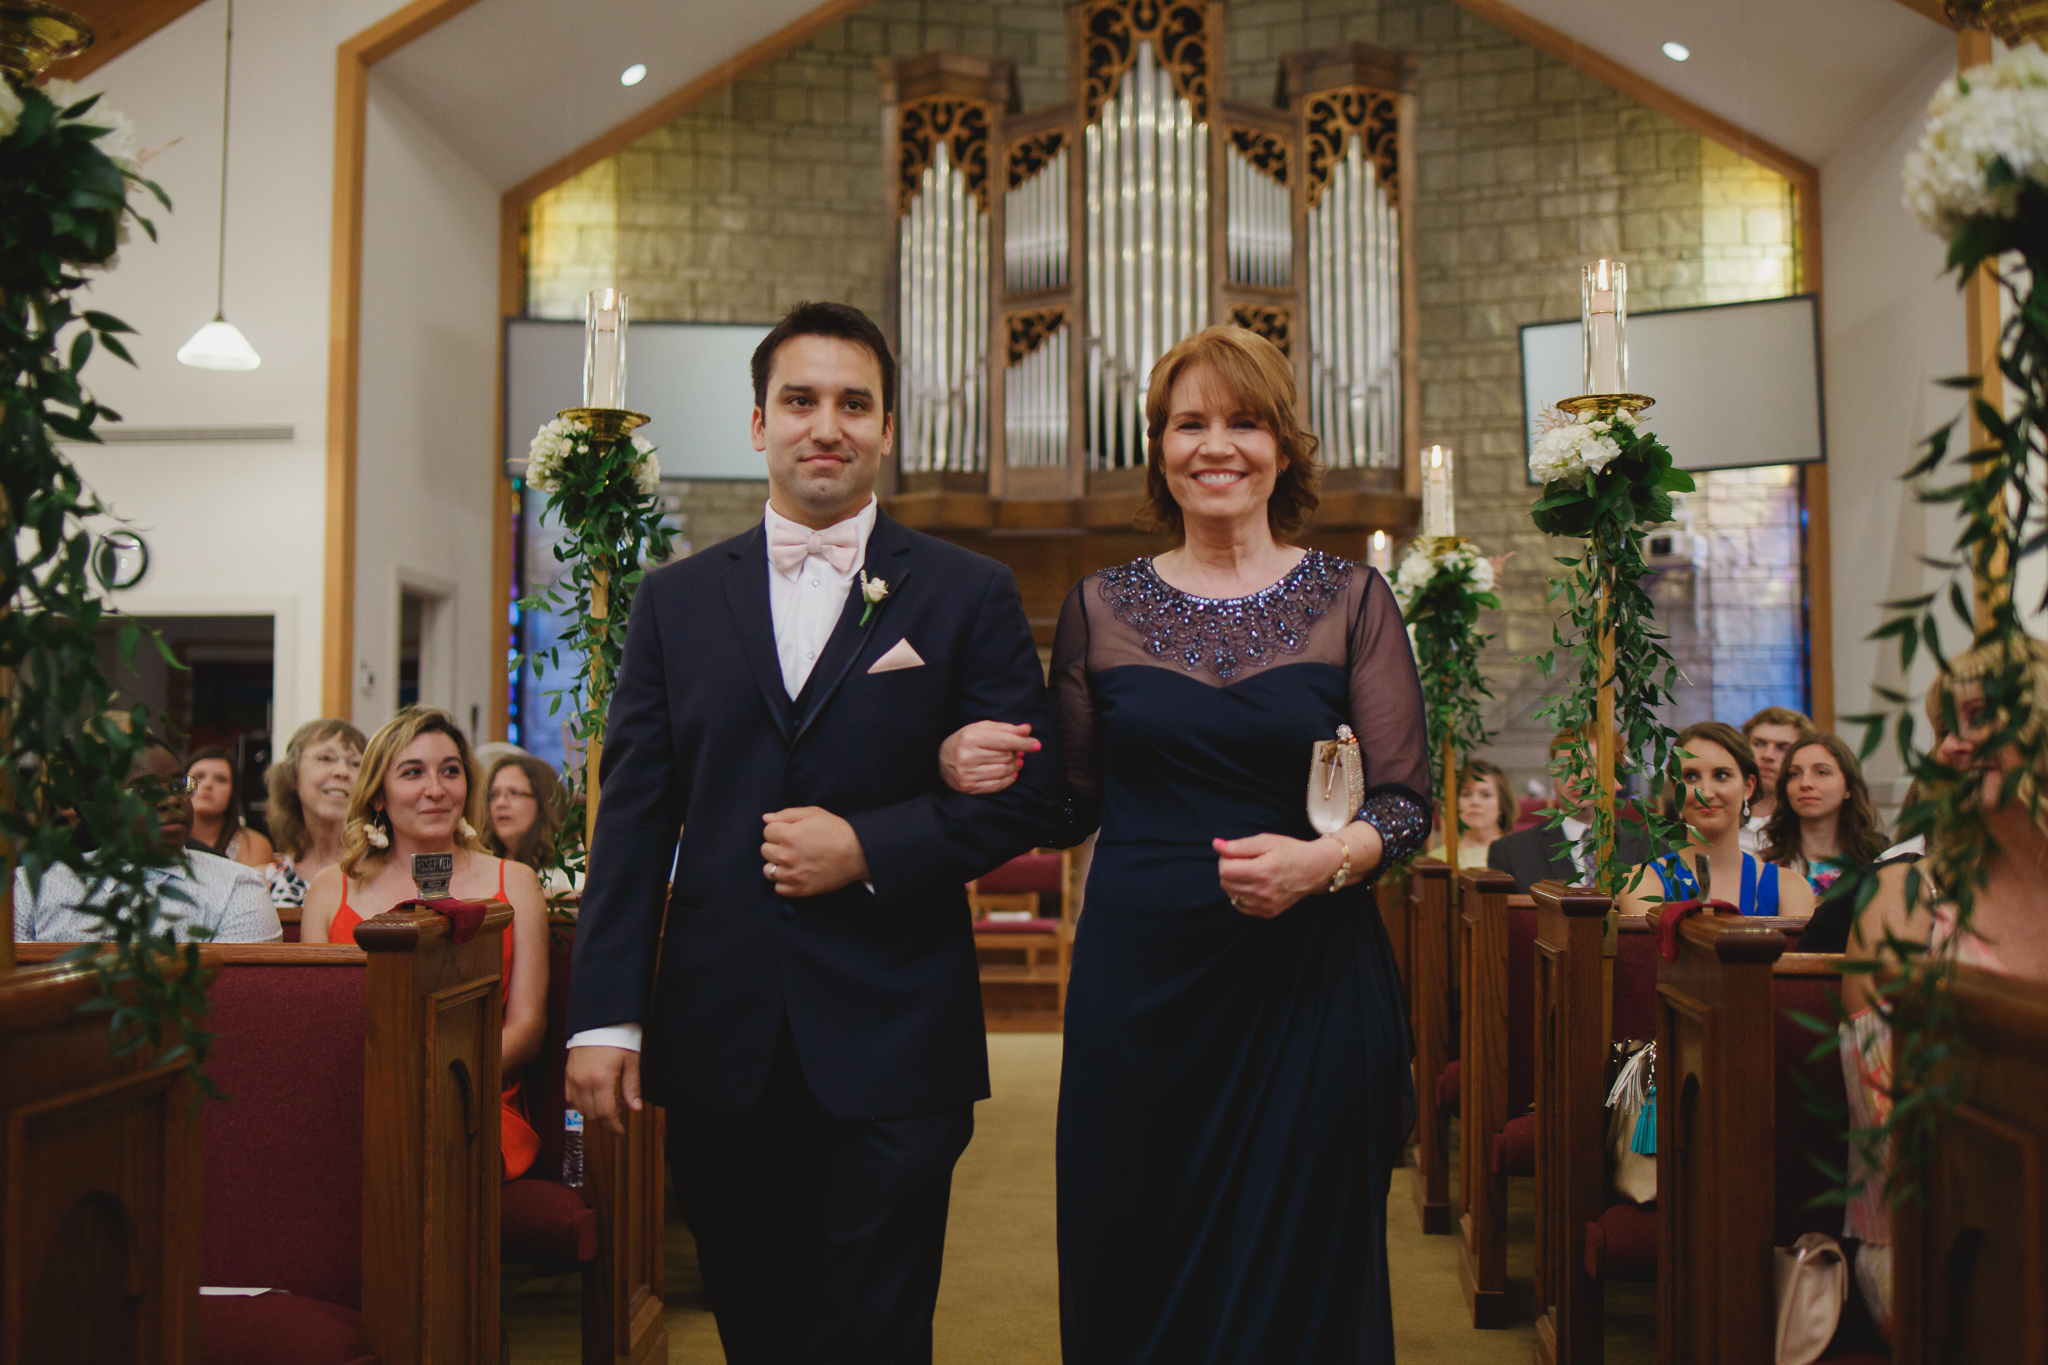 Michael and Kelly - the ashton depot - wedding DFW - wedding photographer- elizalde photography (16 of 150).jpg